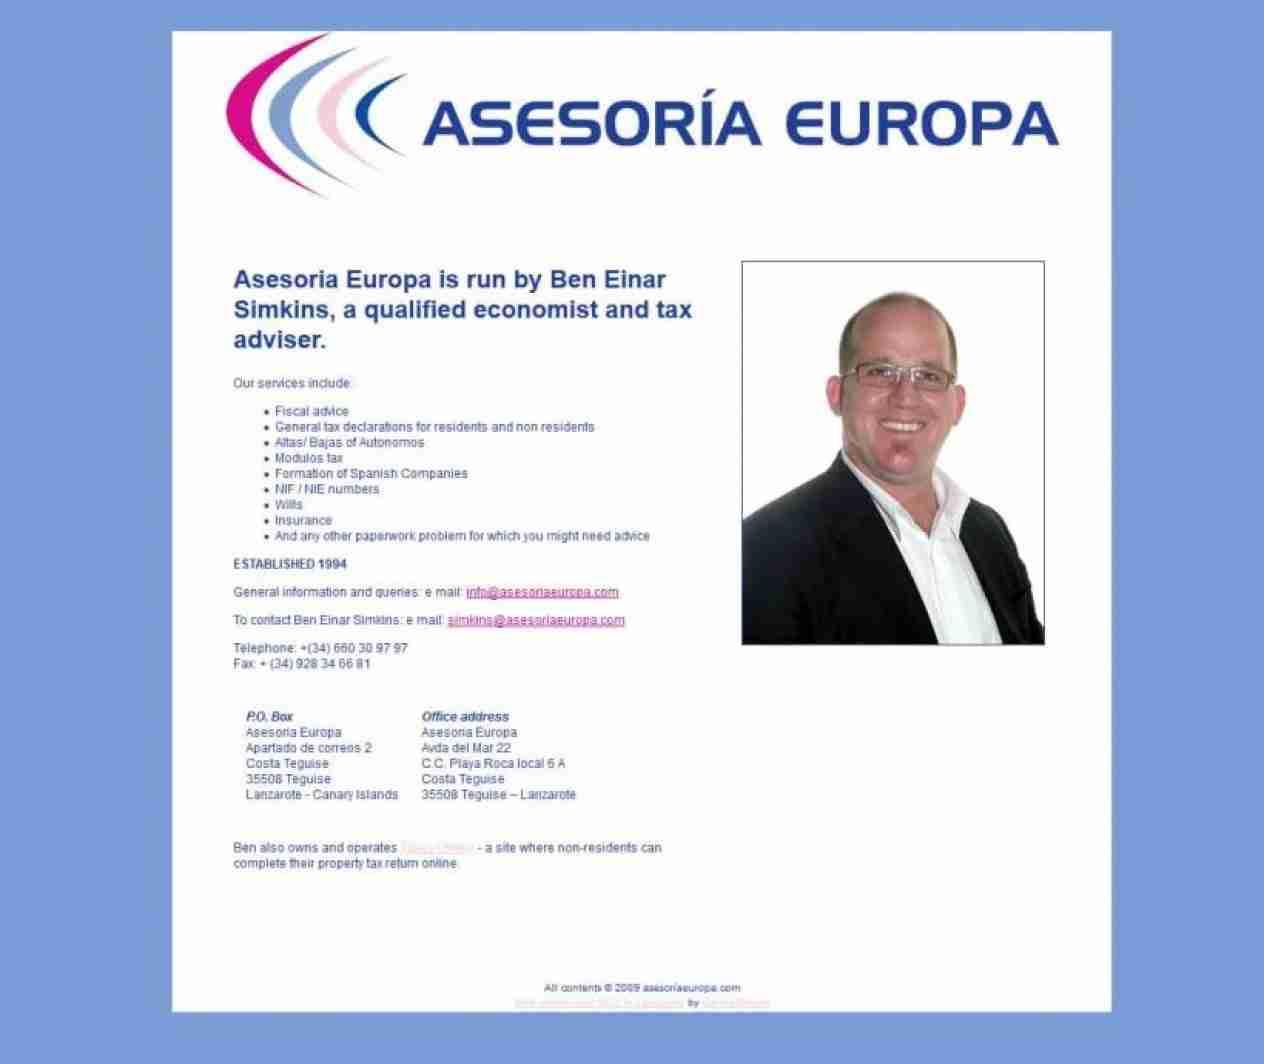 Asesoria Europa